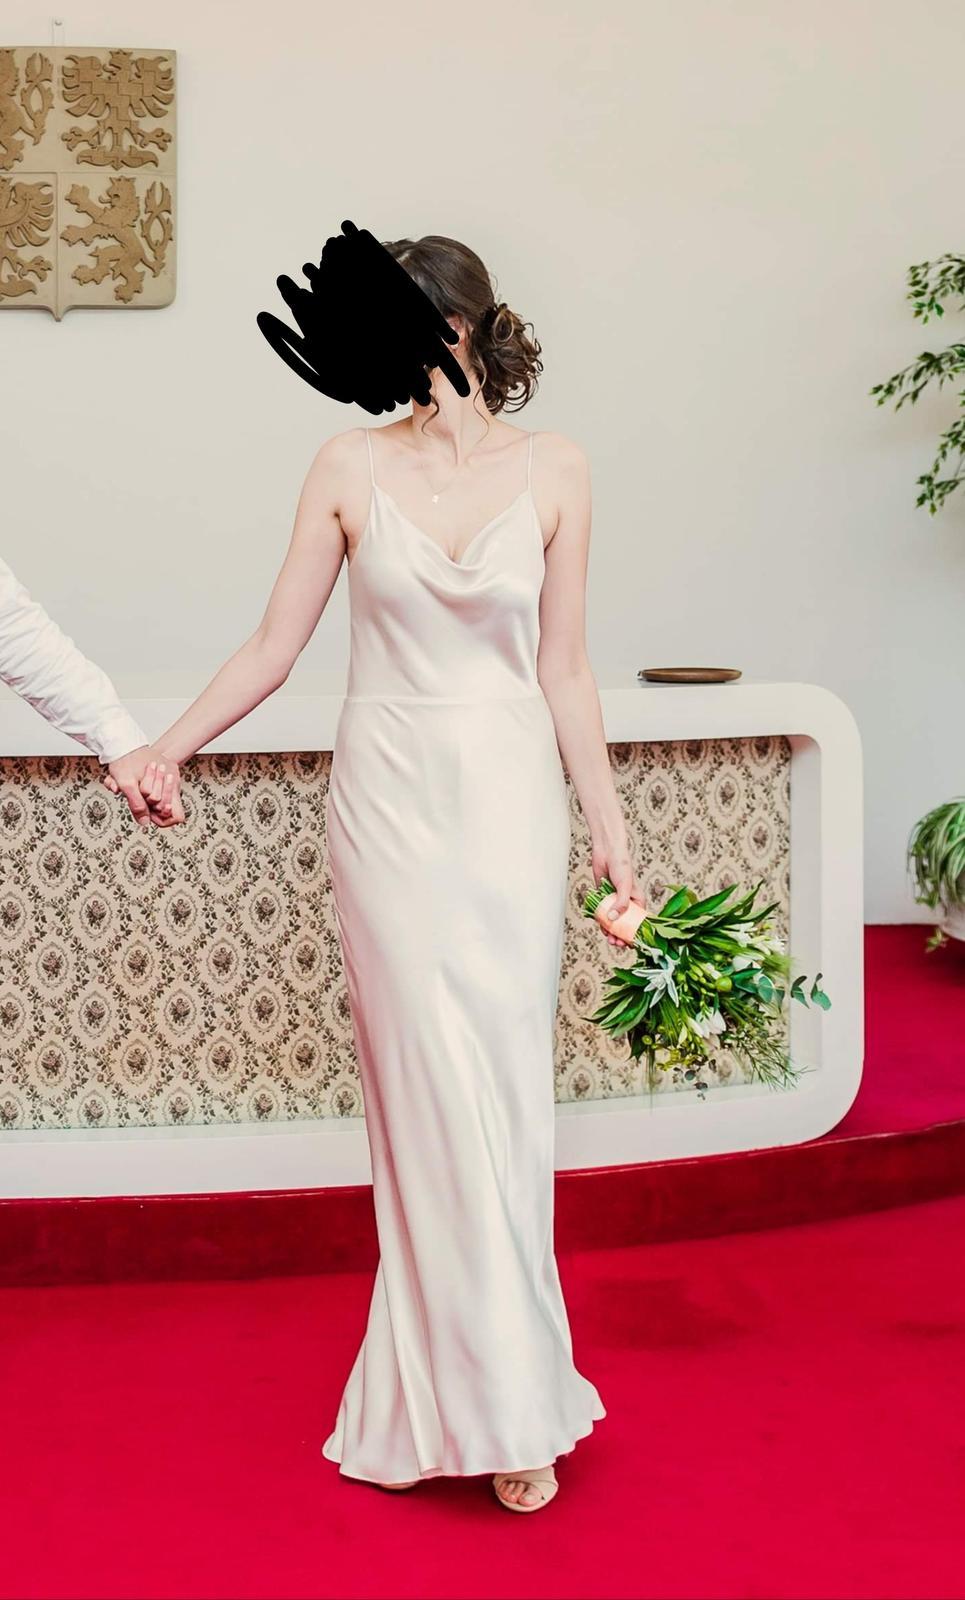 jednoduché saténove šaty - Obrázok č. 1